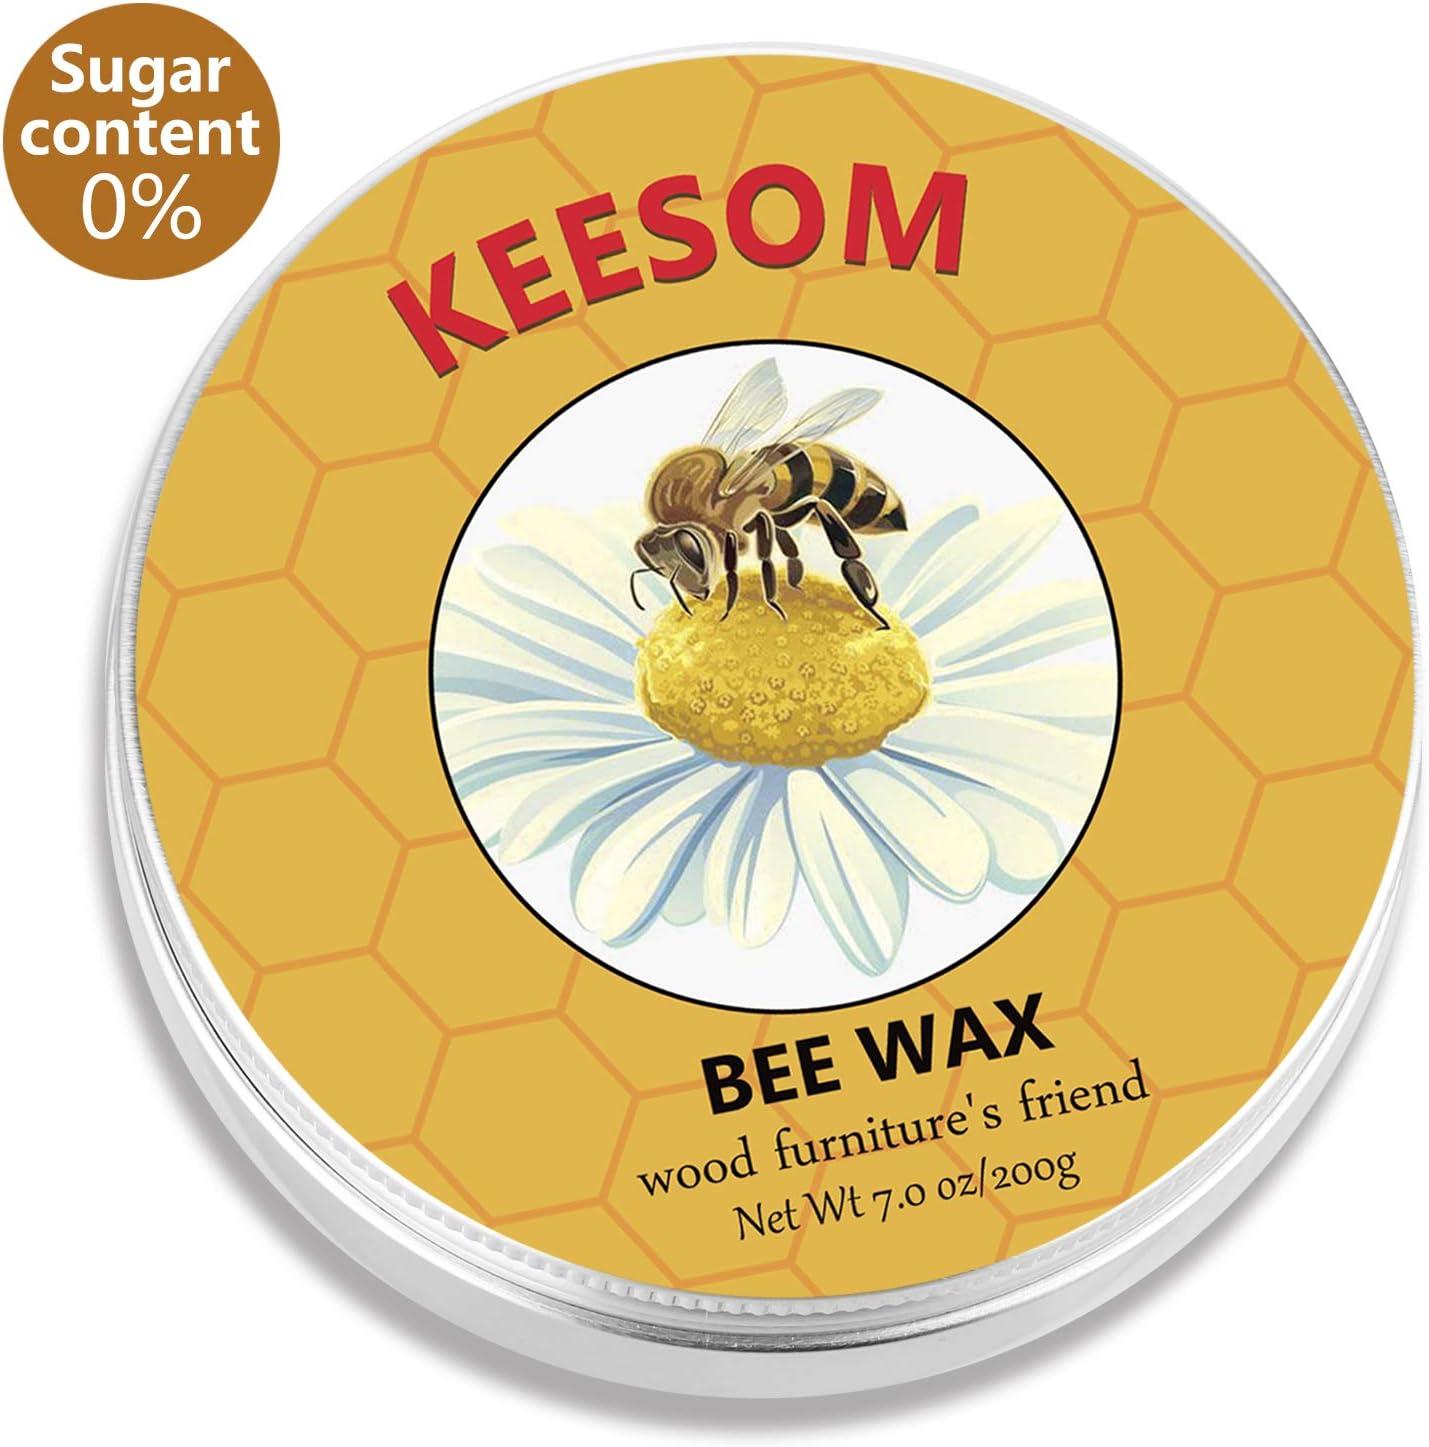 Beeswax Furniture Polish,High Beeswax Content,Sugar Free,Wood Seasoning Beeswax